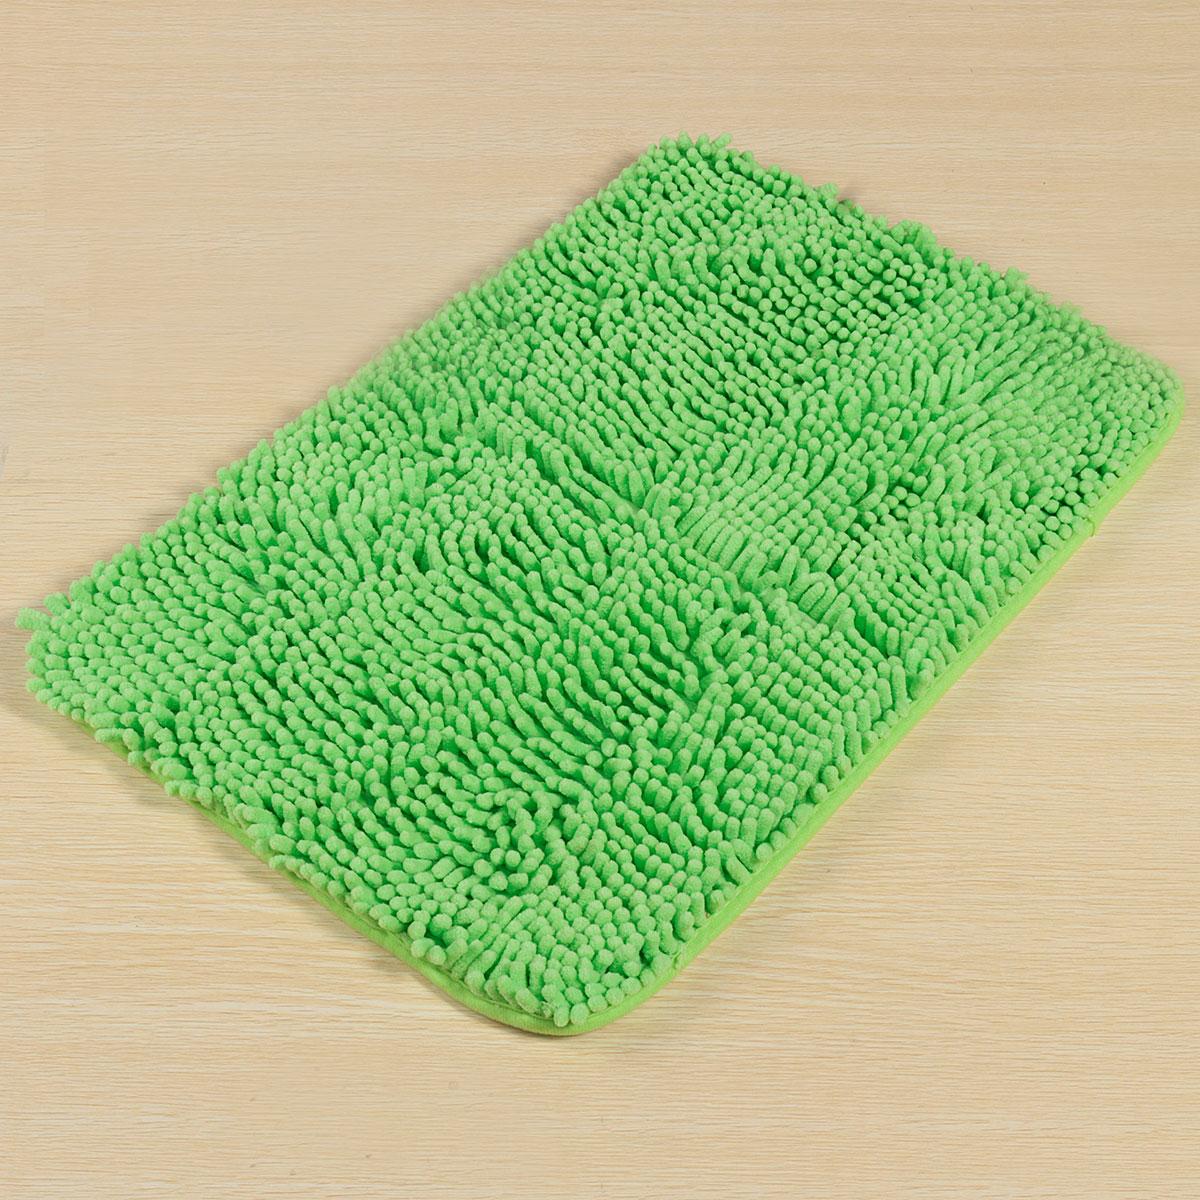 Washable bedroom floor mat shaggy rugs non slip pad thick shag pile 40x60cm green intl - Deep pile carpet protector ...